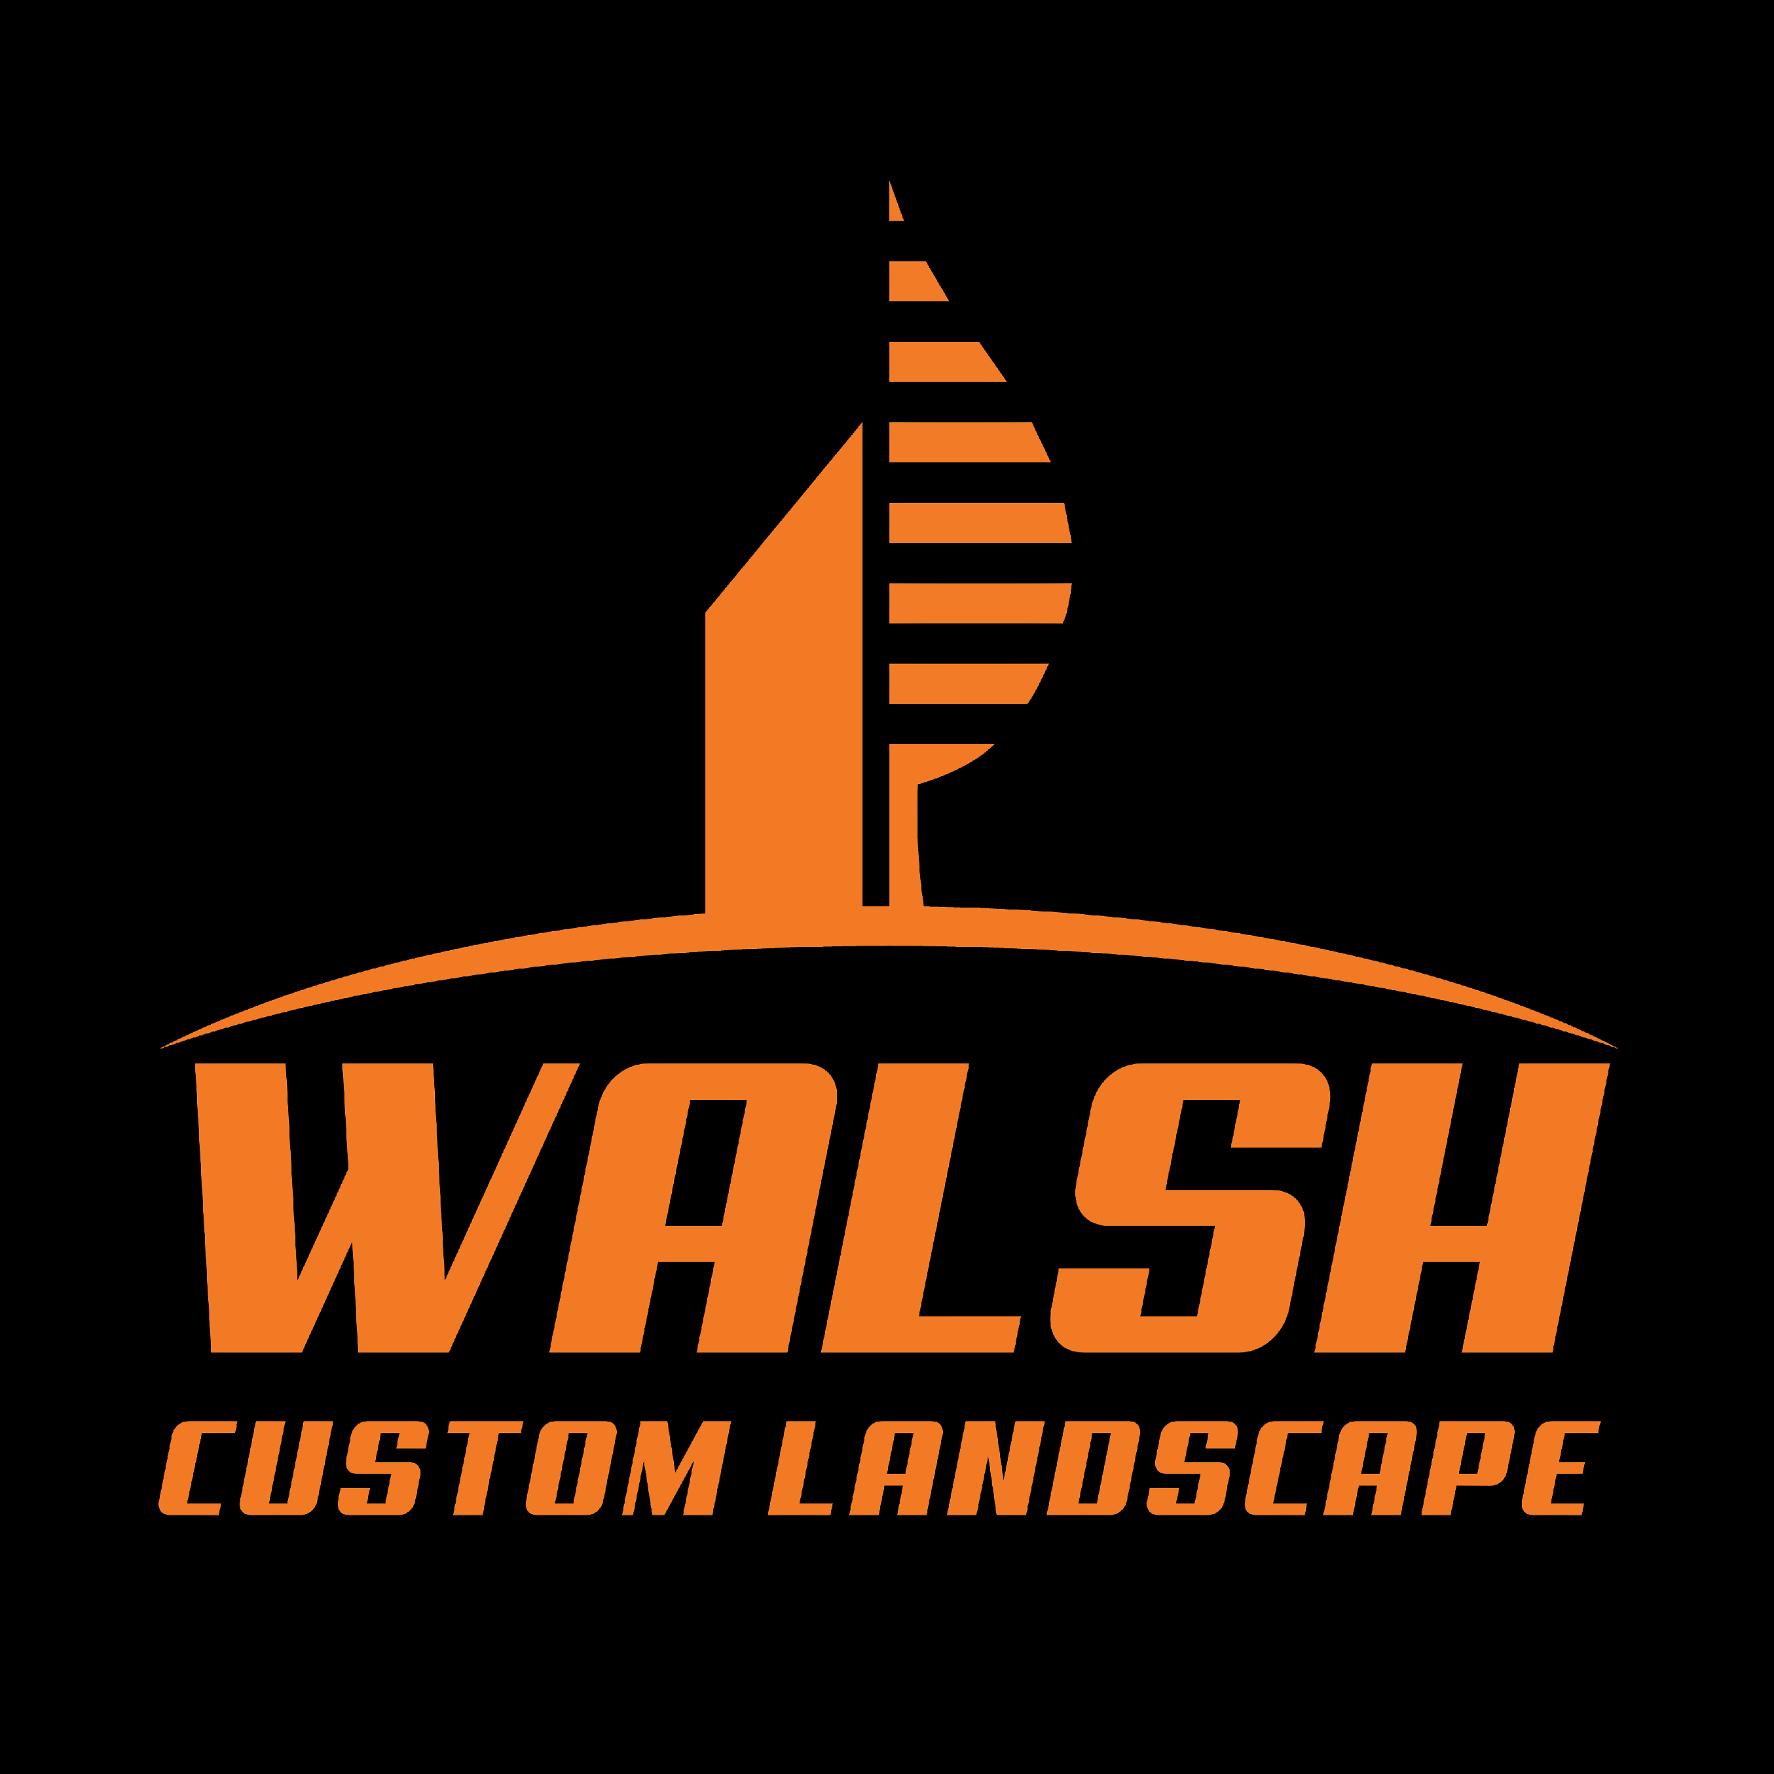 Walsh Custom Landscape